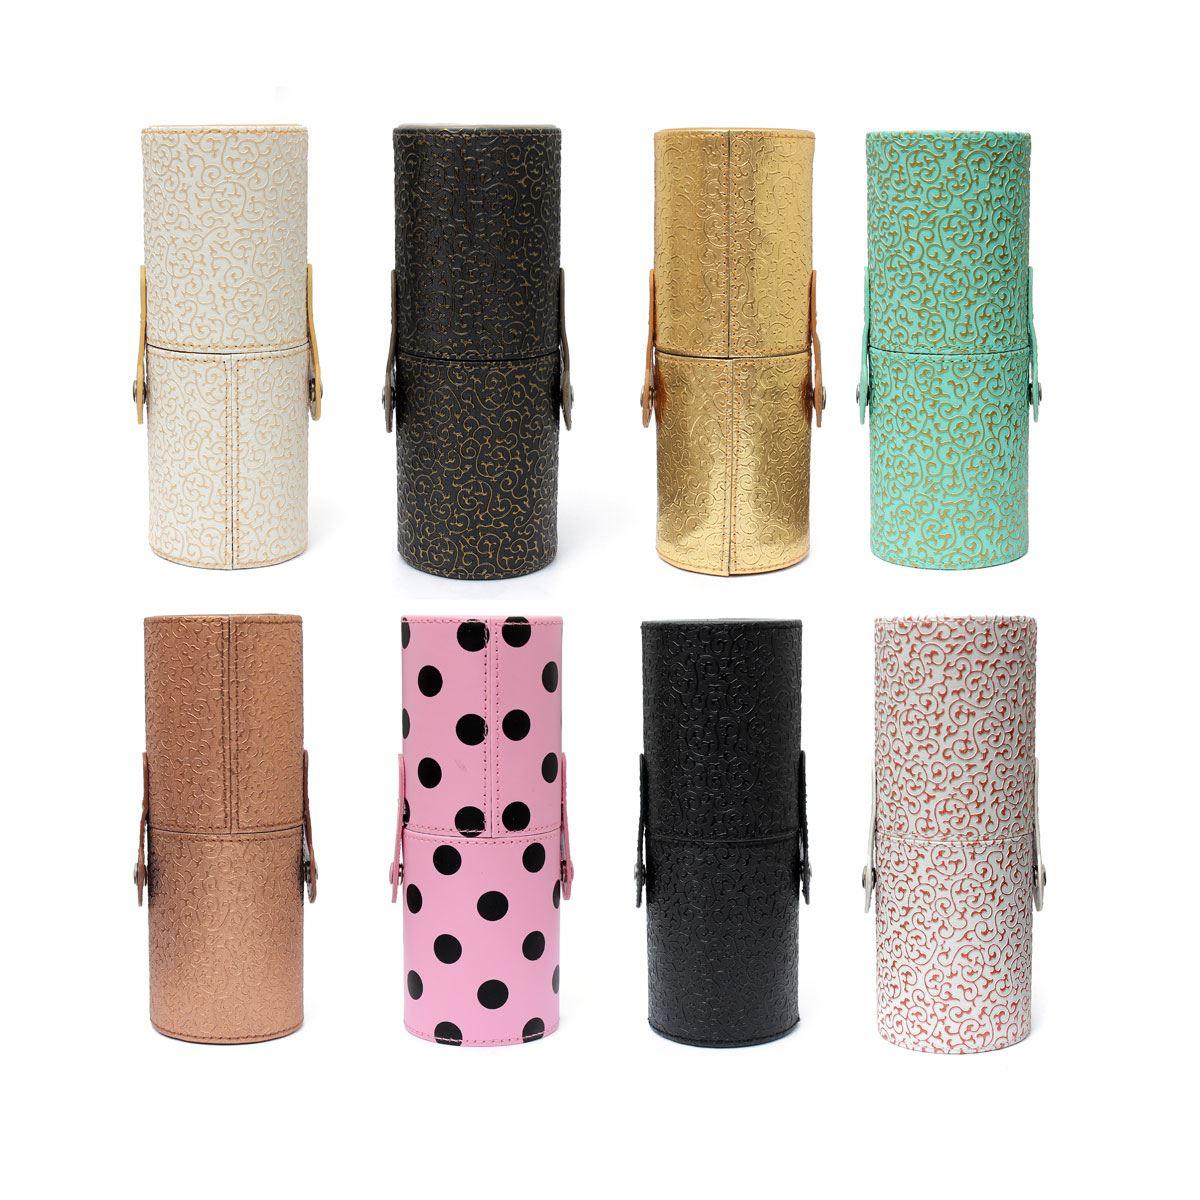 2015 Hotting 1pcs Pro Makeup Brushes Kits Leather Cup Holder Comestic Brushes Organizer Empty Case 8 Style To Choose(China (Mainland))